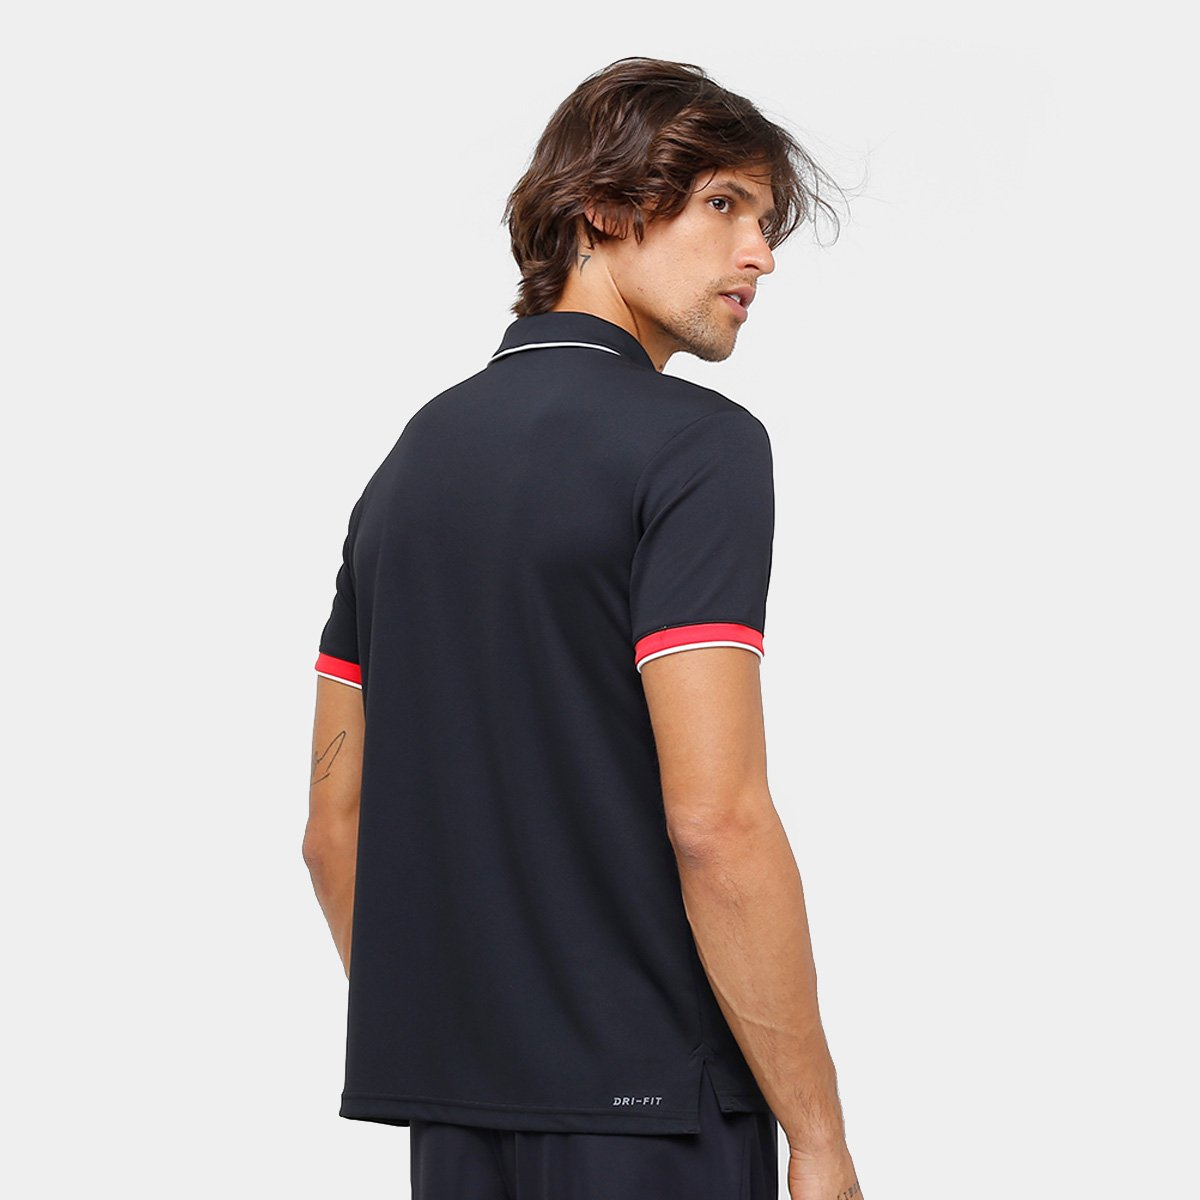 Camiseta Polo Nike Team Masculina  Camiseta Polo Nike Team Masculina ... a689d33ac2276